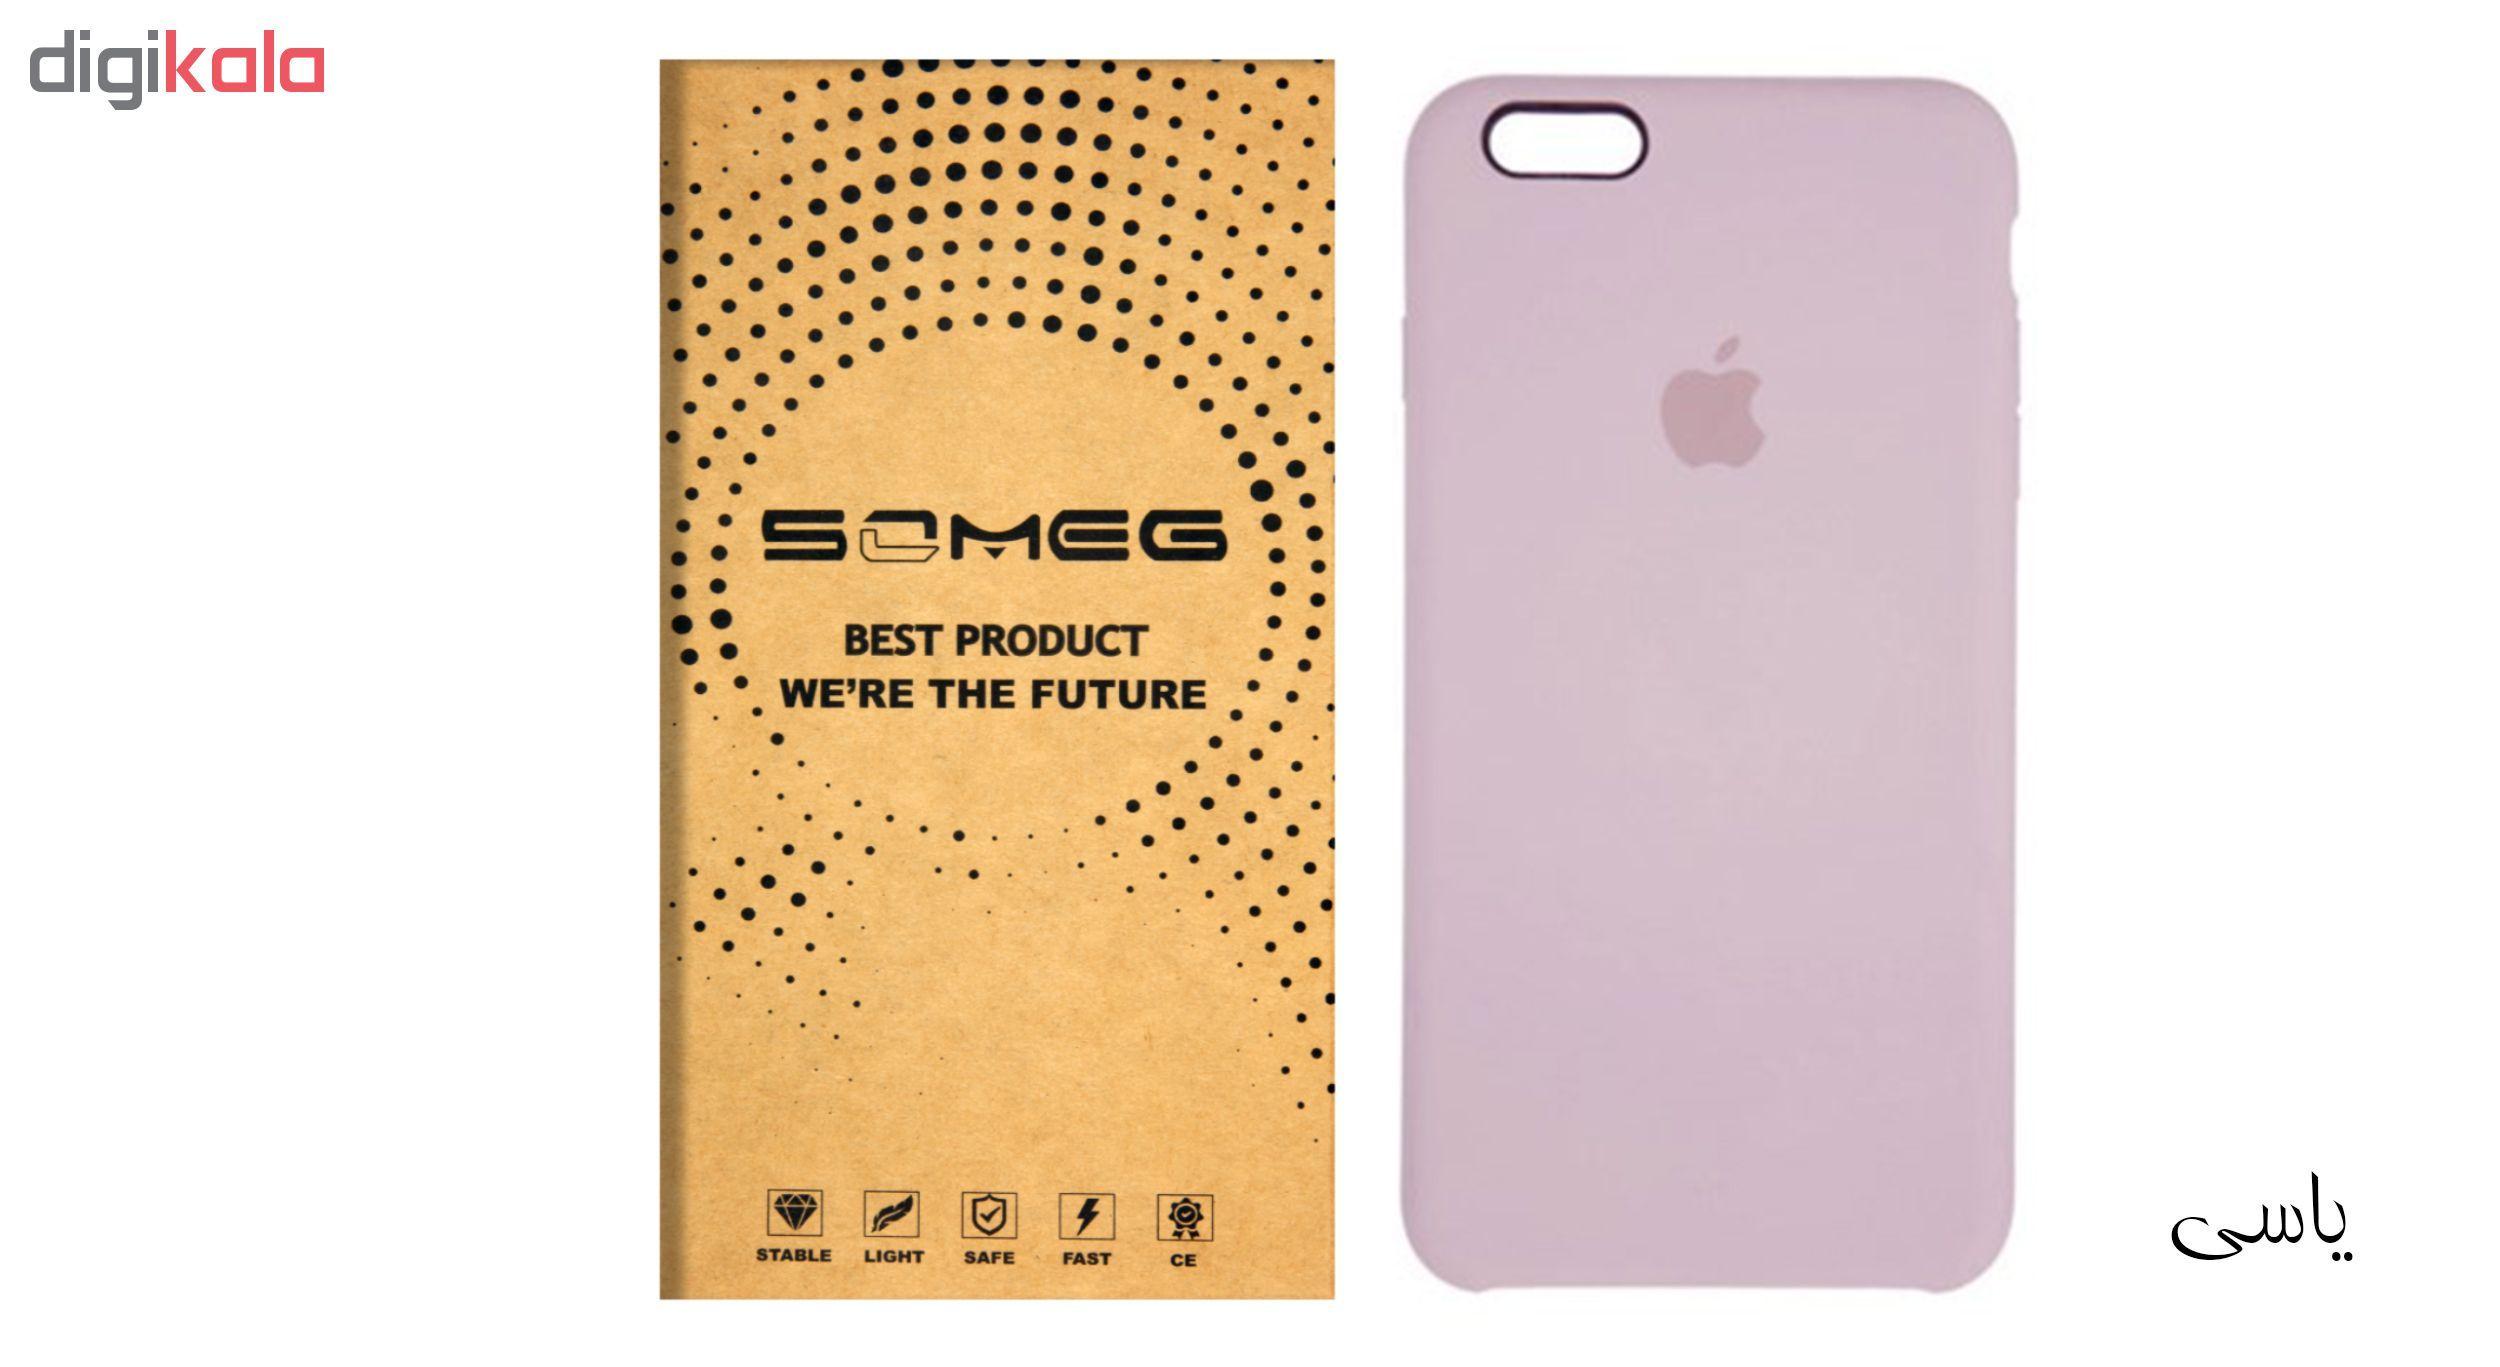 کاور سومگ مدل SIC مناسب برای گوشی موبایل اپل iPhone 6/6s main 1 17